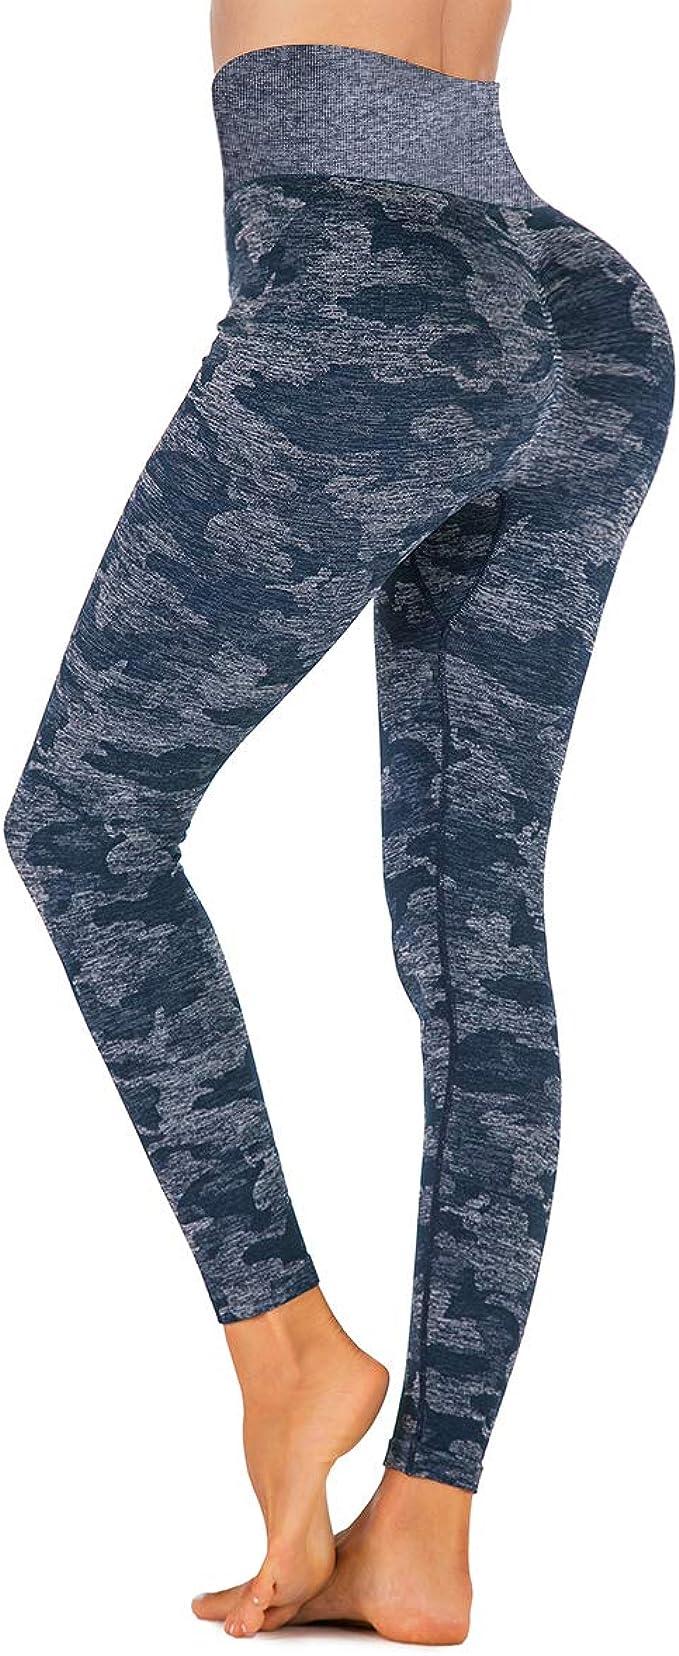 Yaavii Women Christmas Leggings High Waist Yoga Pants Tummy Control Gym Workout Leggings